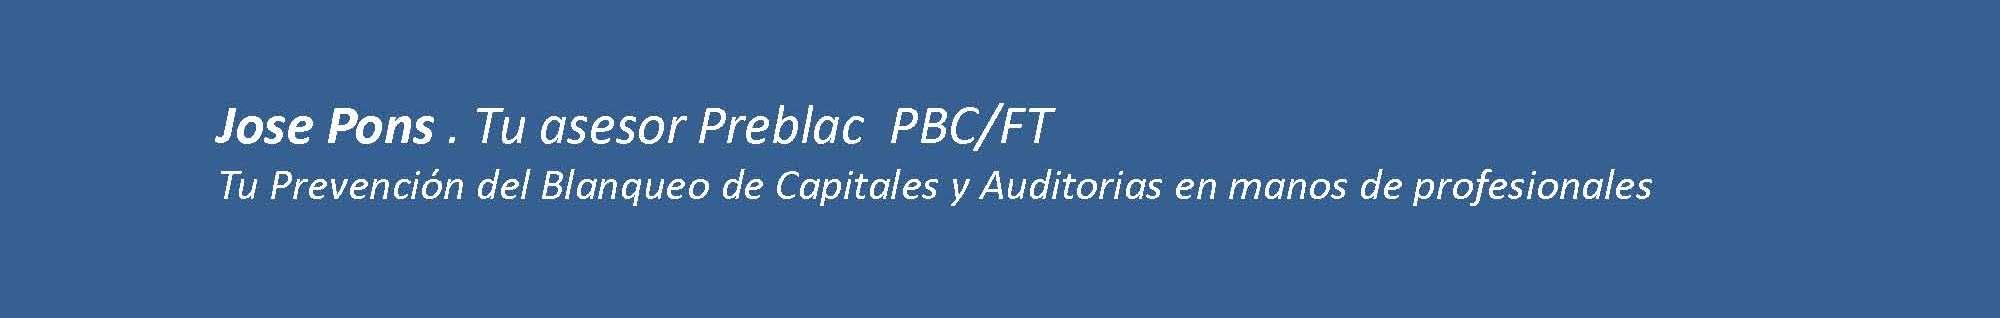 Jose Pons. Tu Asesor Preblac PBC/FT